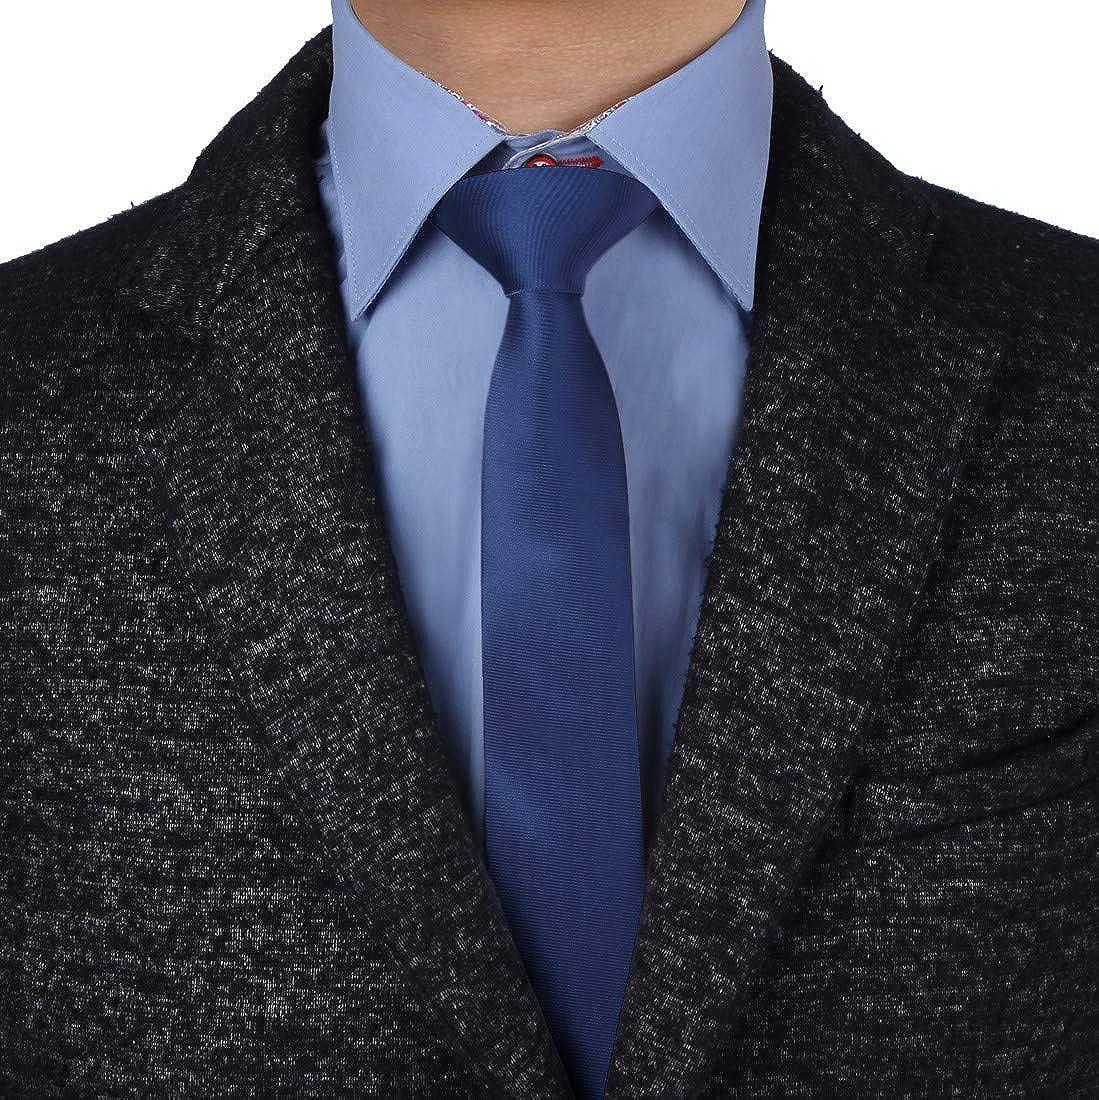 Epoint Men's Fashion Casual Plain Slim Tie Silk Men's Skinny Tie 2